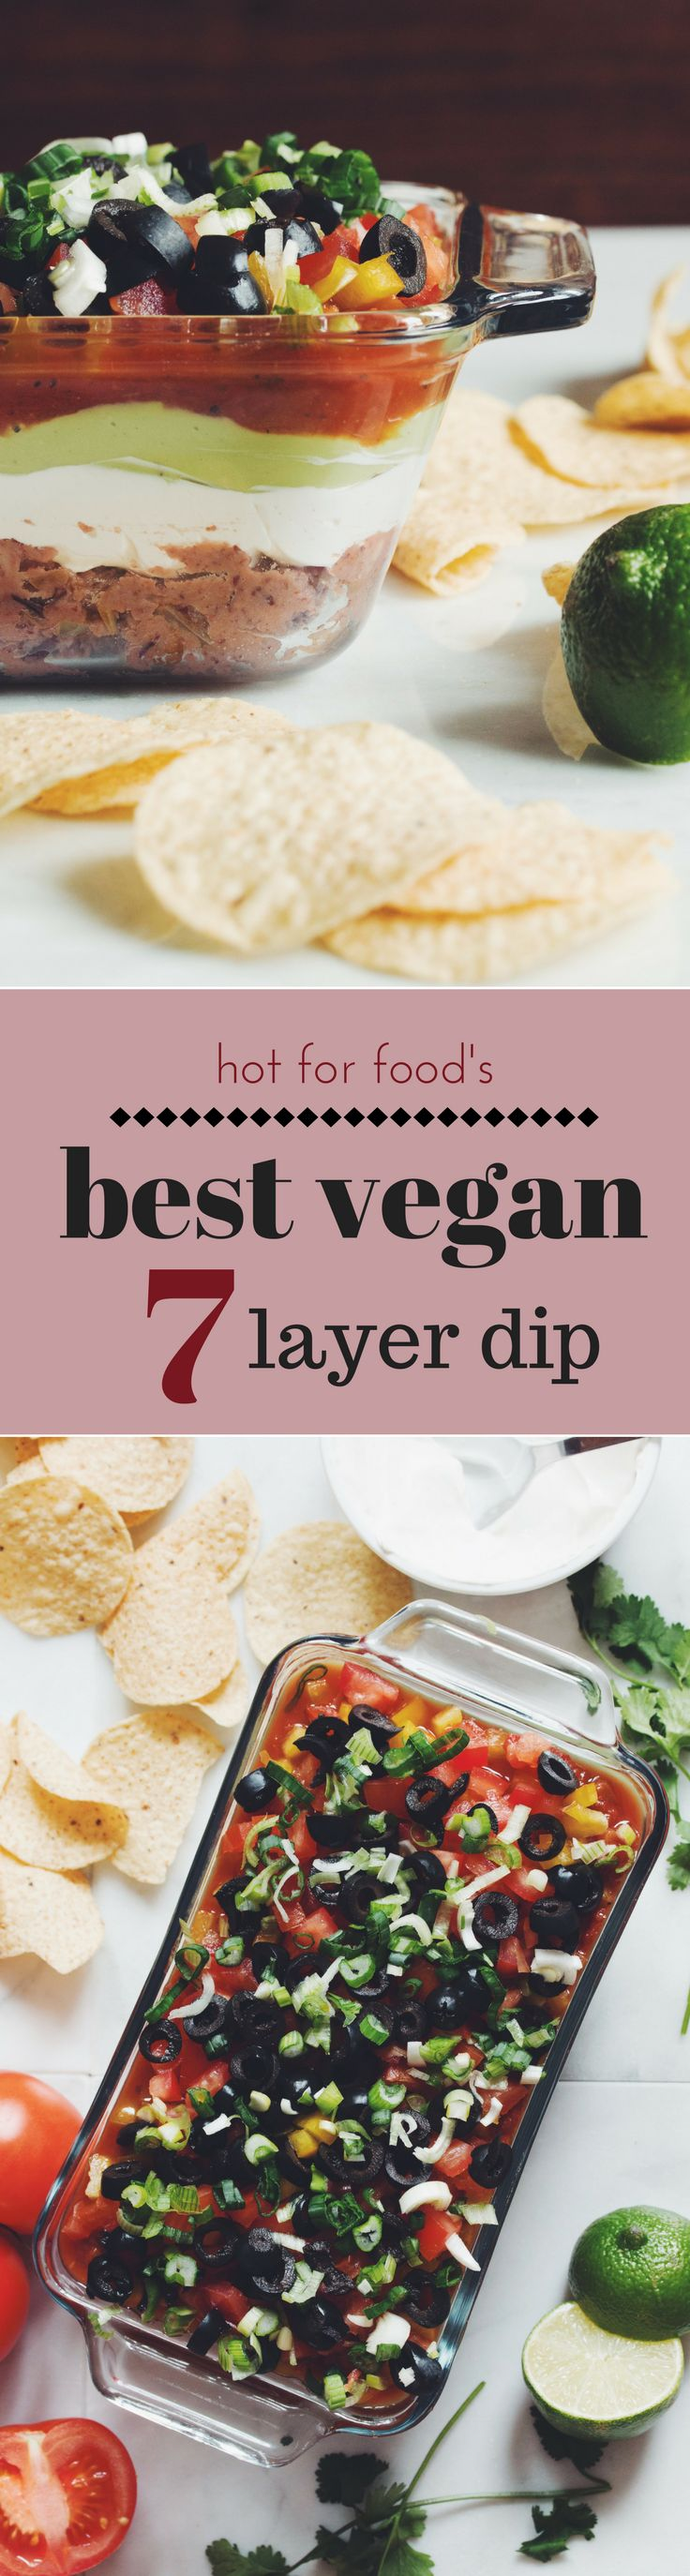 the best vegan 7 layer dip | RECIPE on hotforfoodblog.com